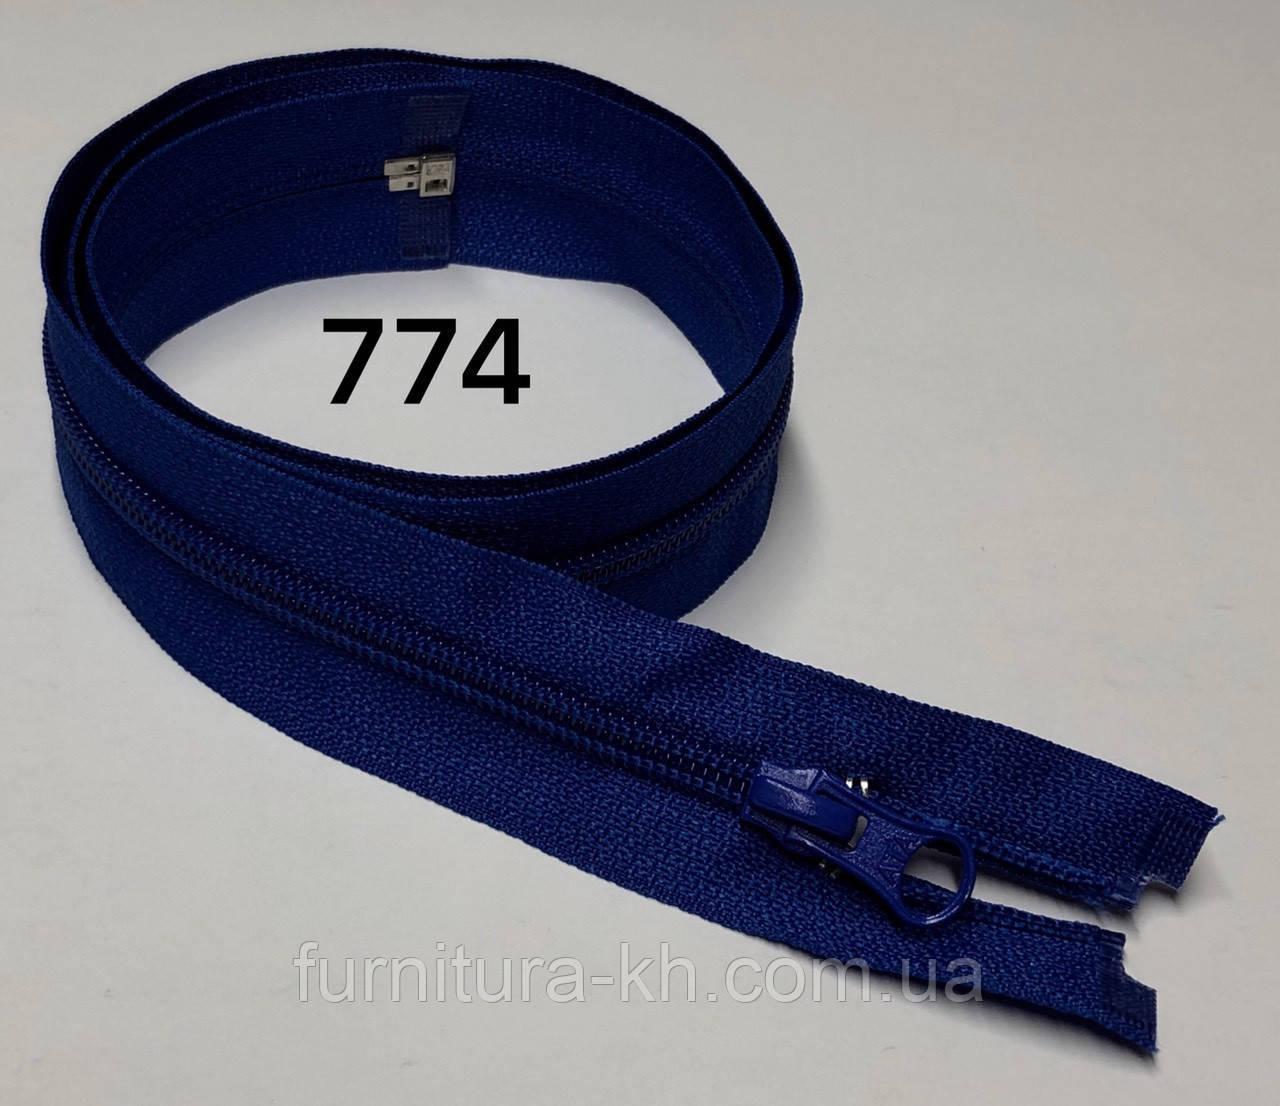 Спираль Тип 5-Длинна 75 см.Цвет 774